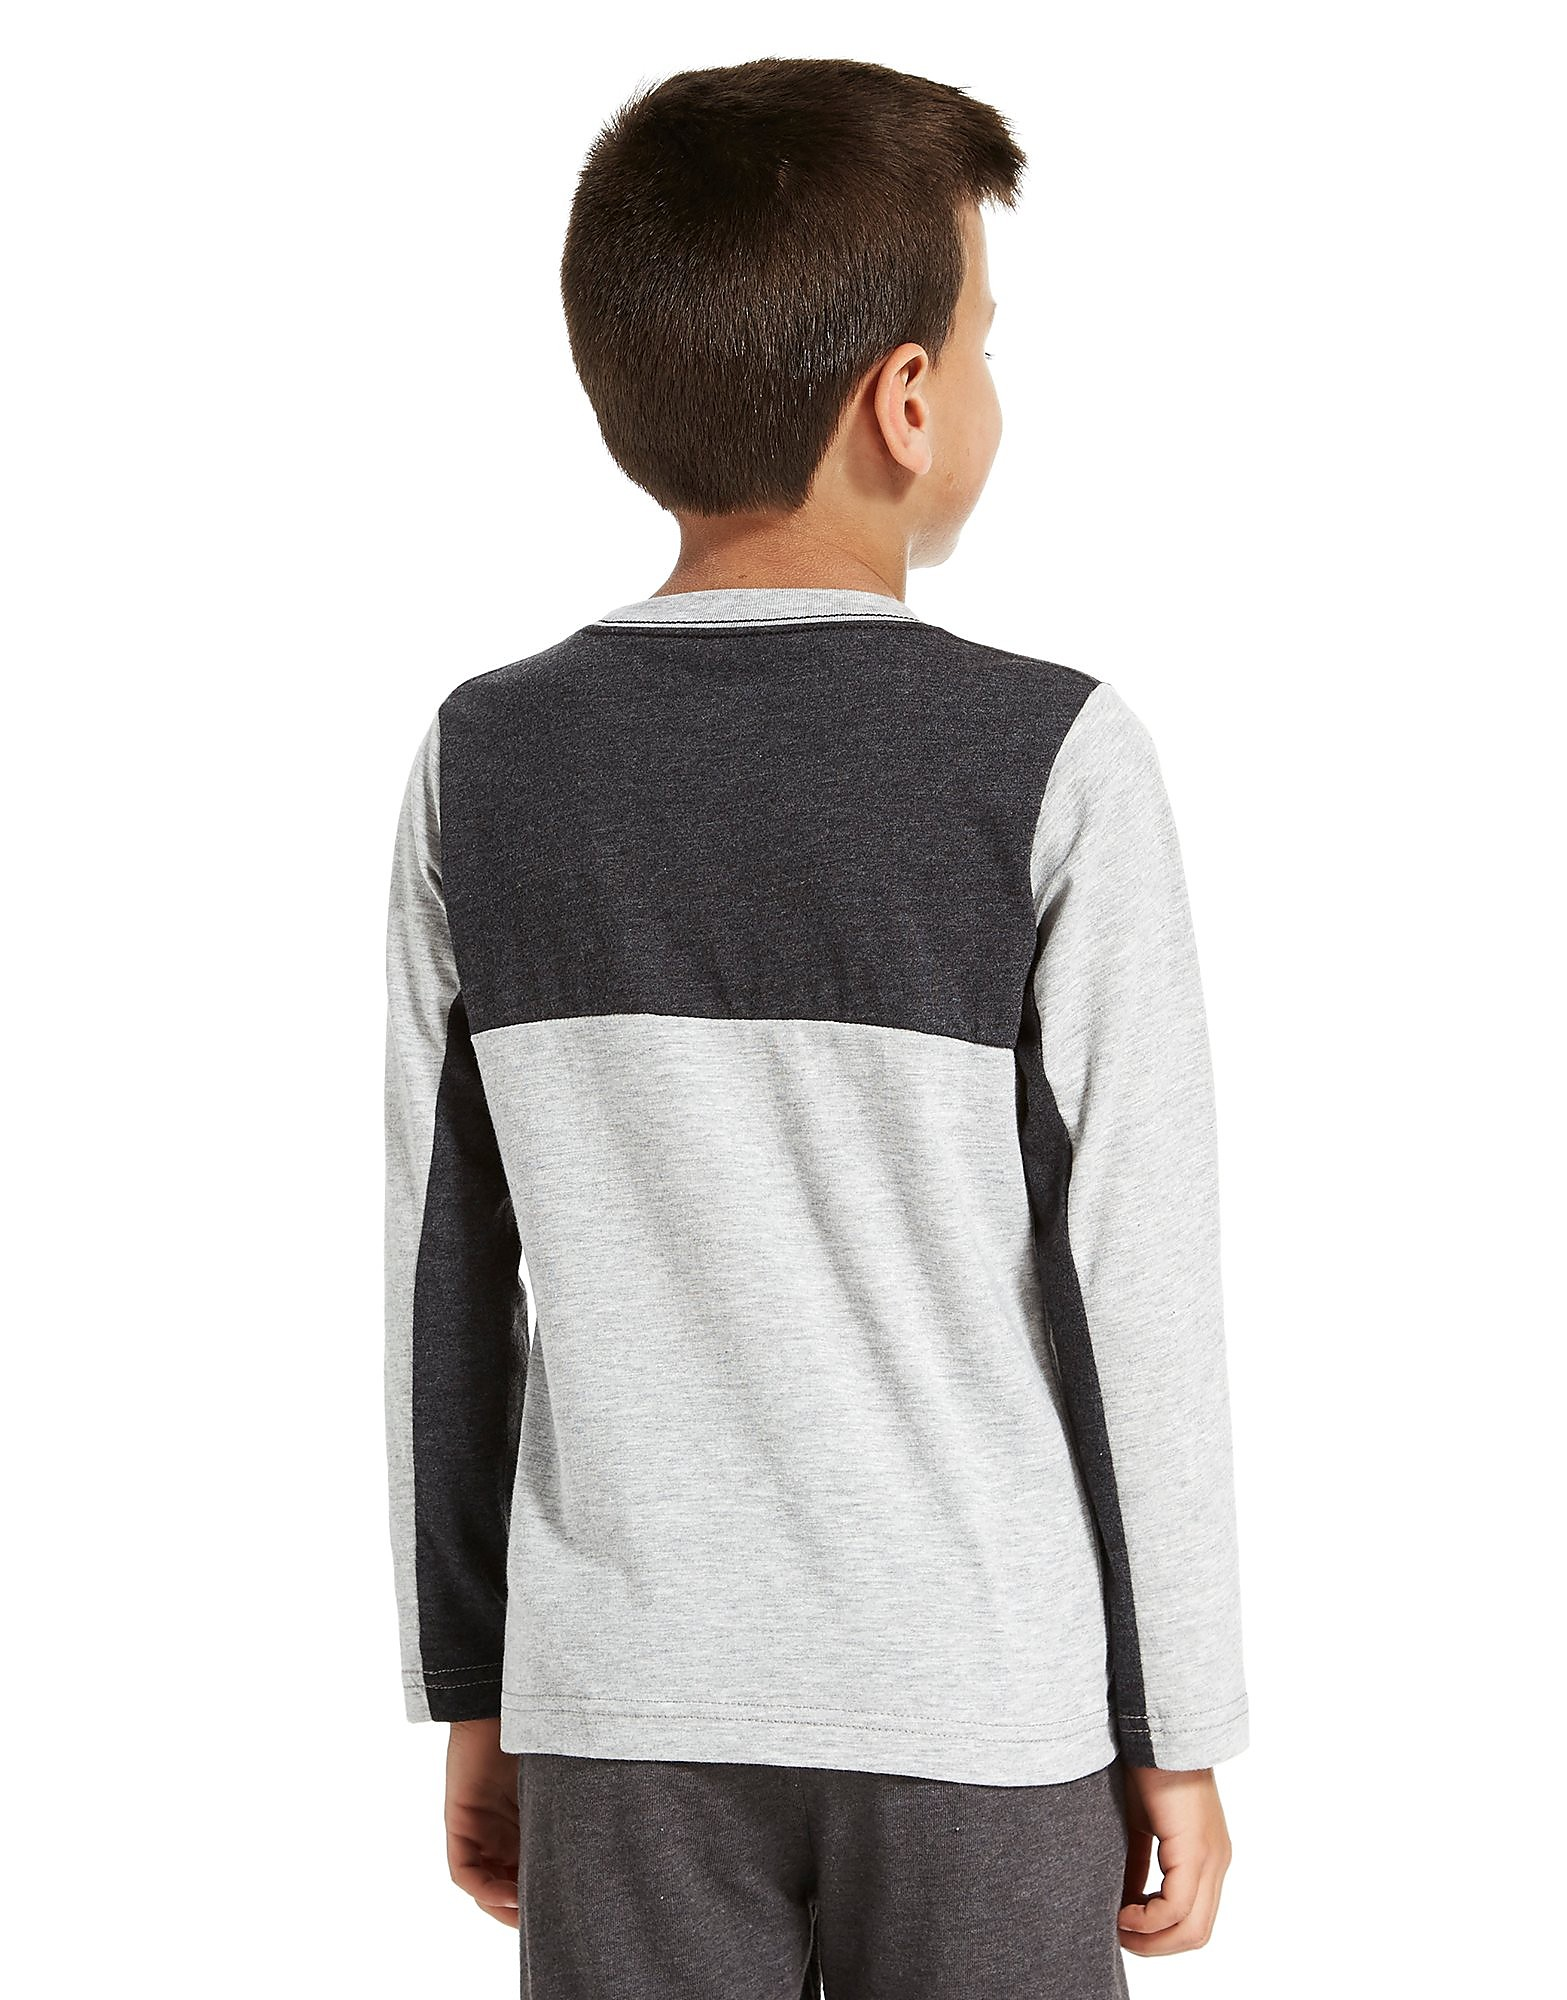 Nike Colour Block Longsleeve T-Shirt Children